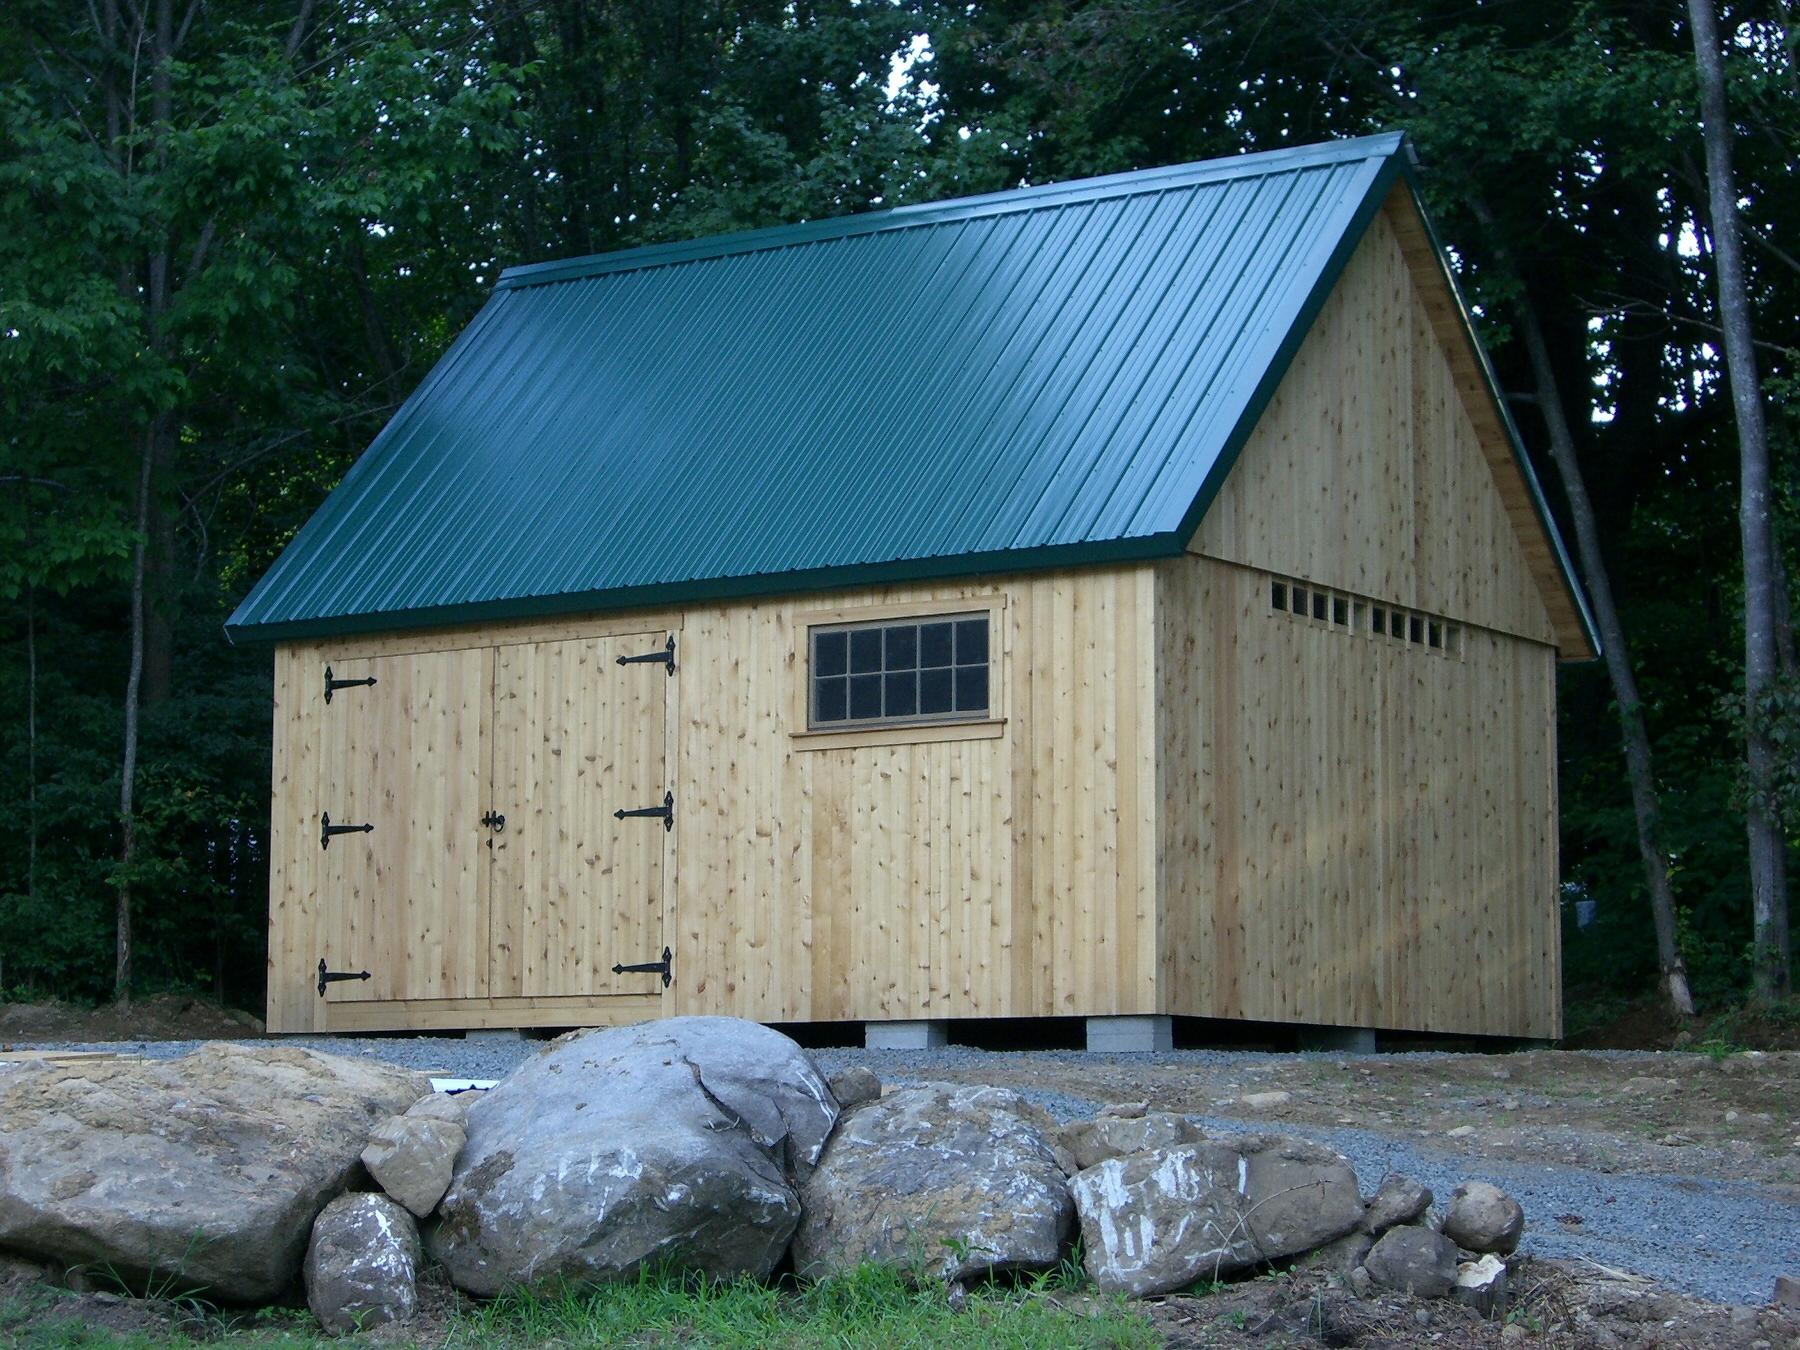 16' x 20' Post and Beam Barn